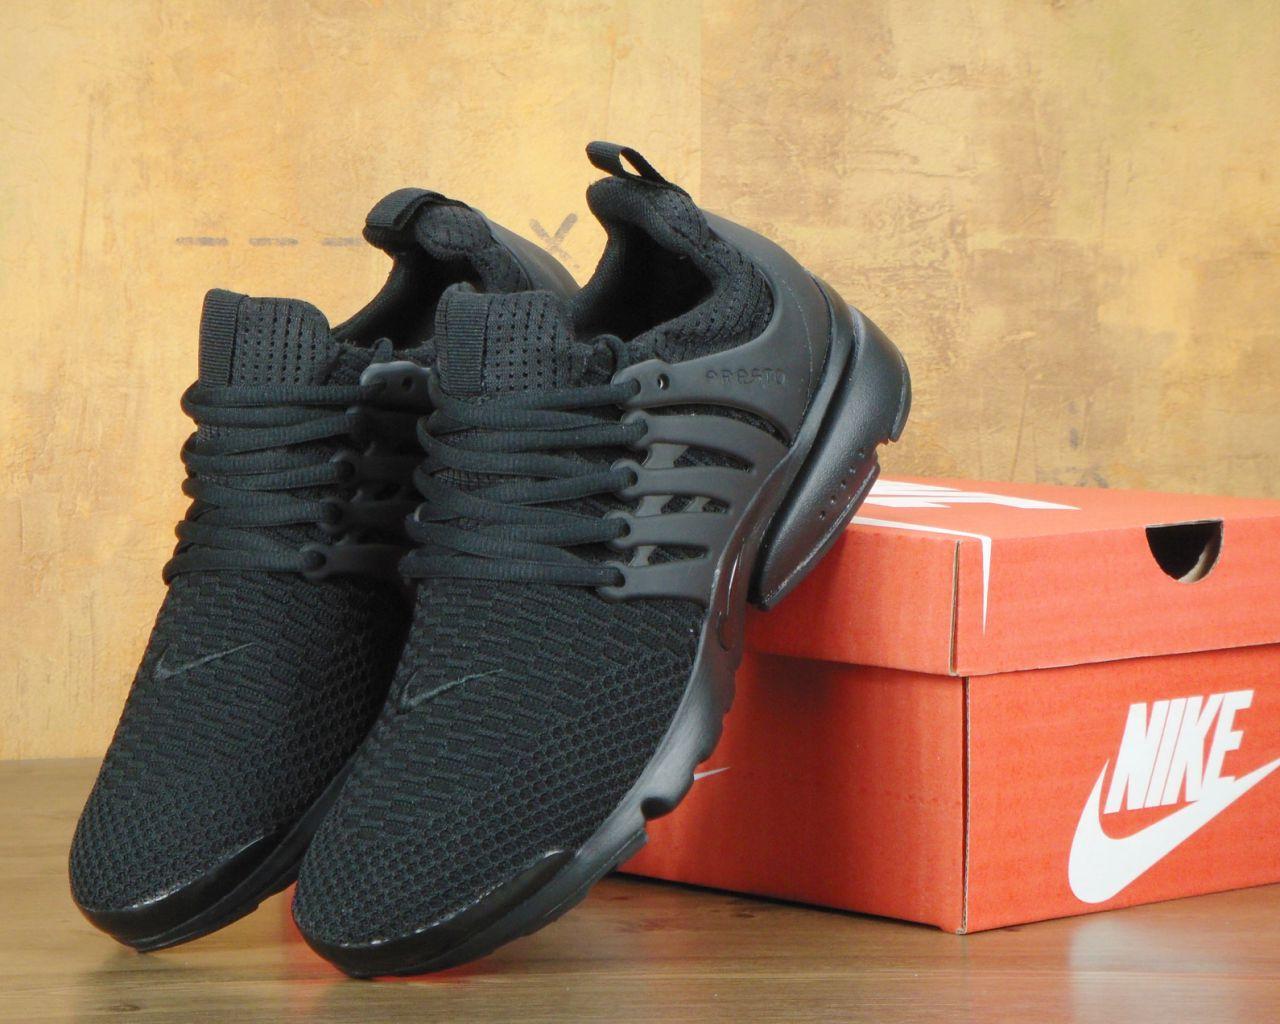 Кроссовки мужские Найк Nike Air Presto ID 'Triple Black'. ТОП Реплика ААА класса.